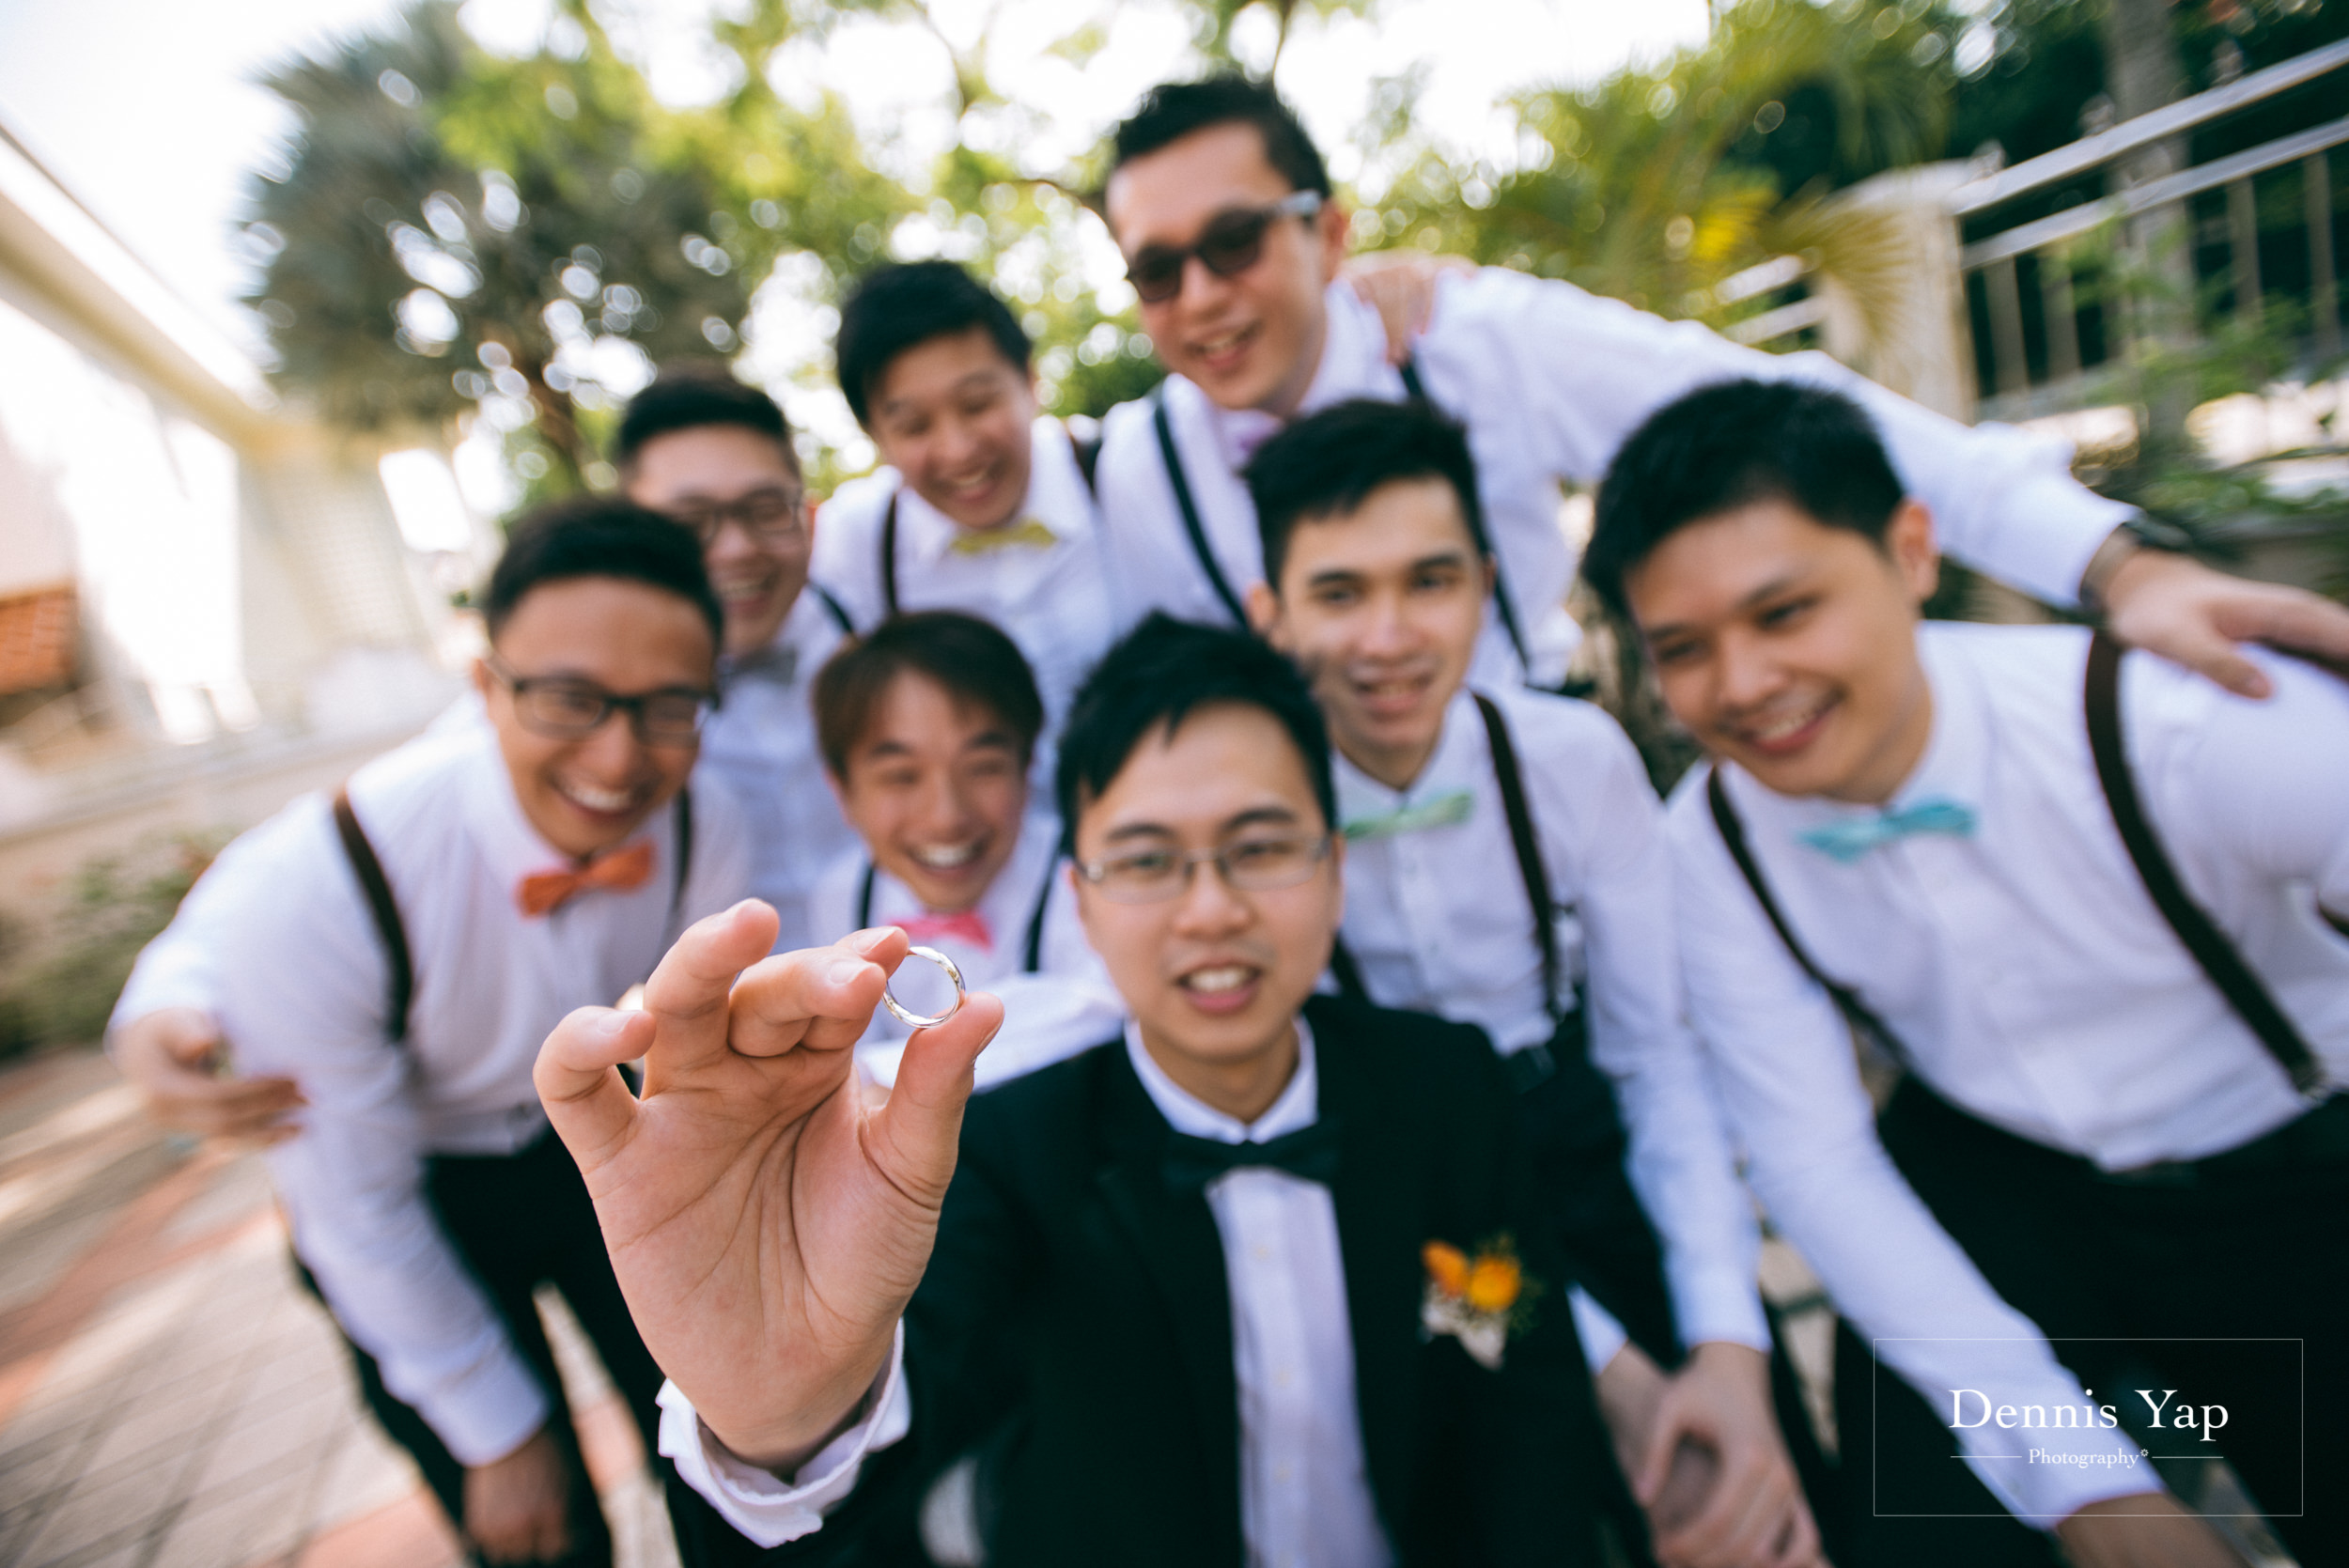 taylai cheng yee wedding day tropicana gold and country club damansara dennis yap photography-8.jpg